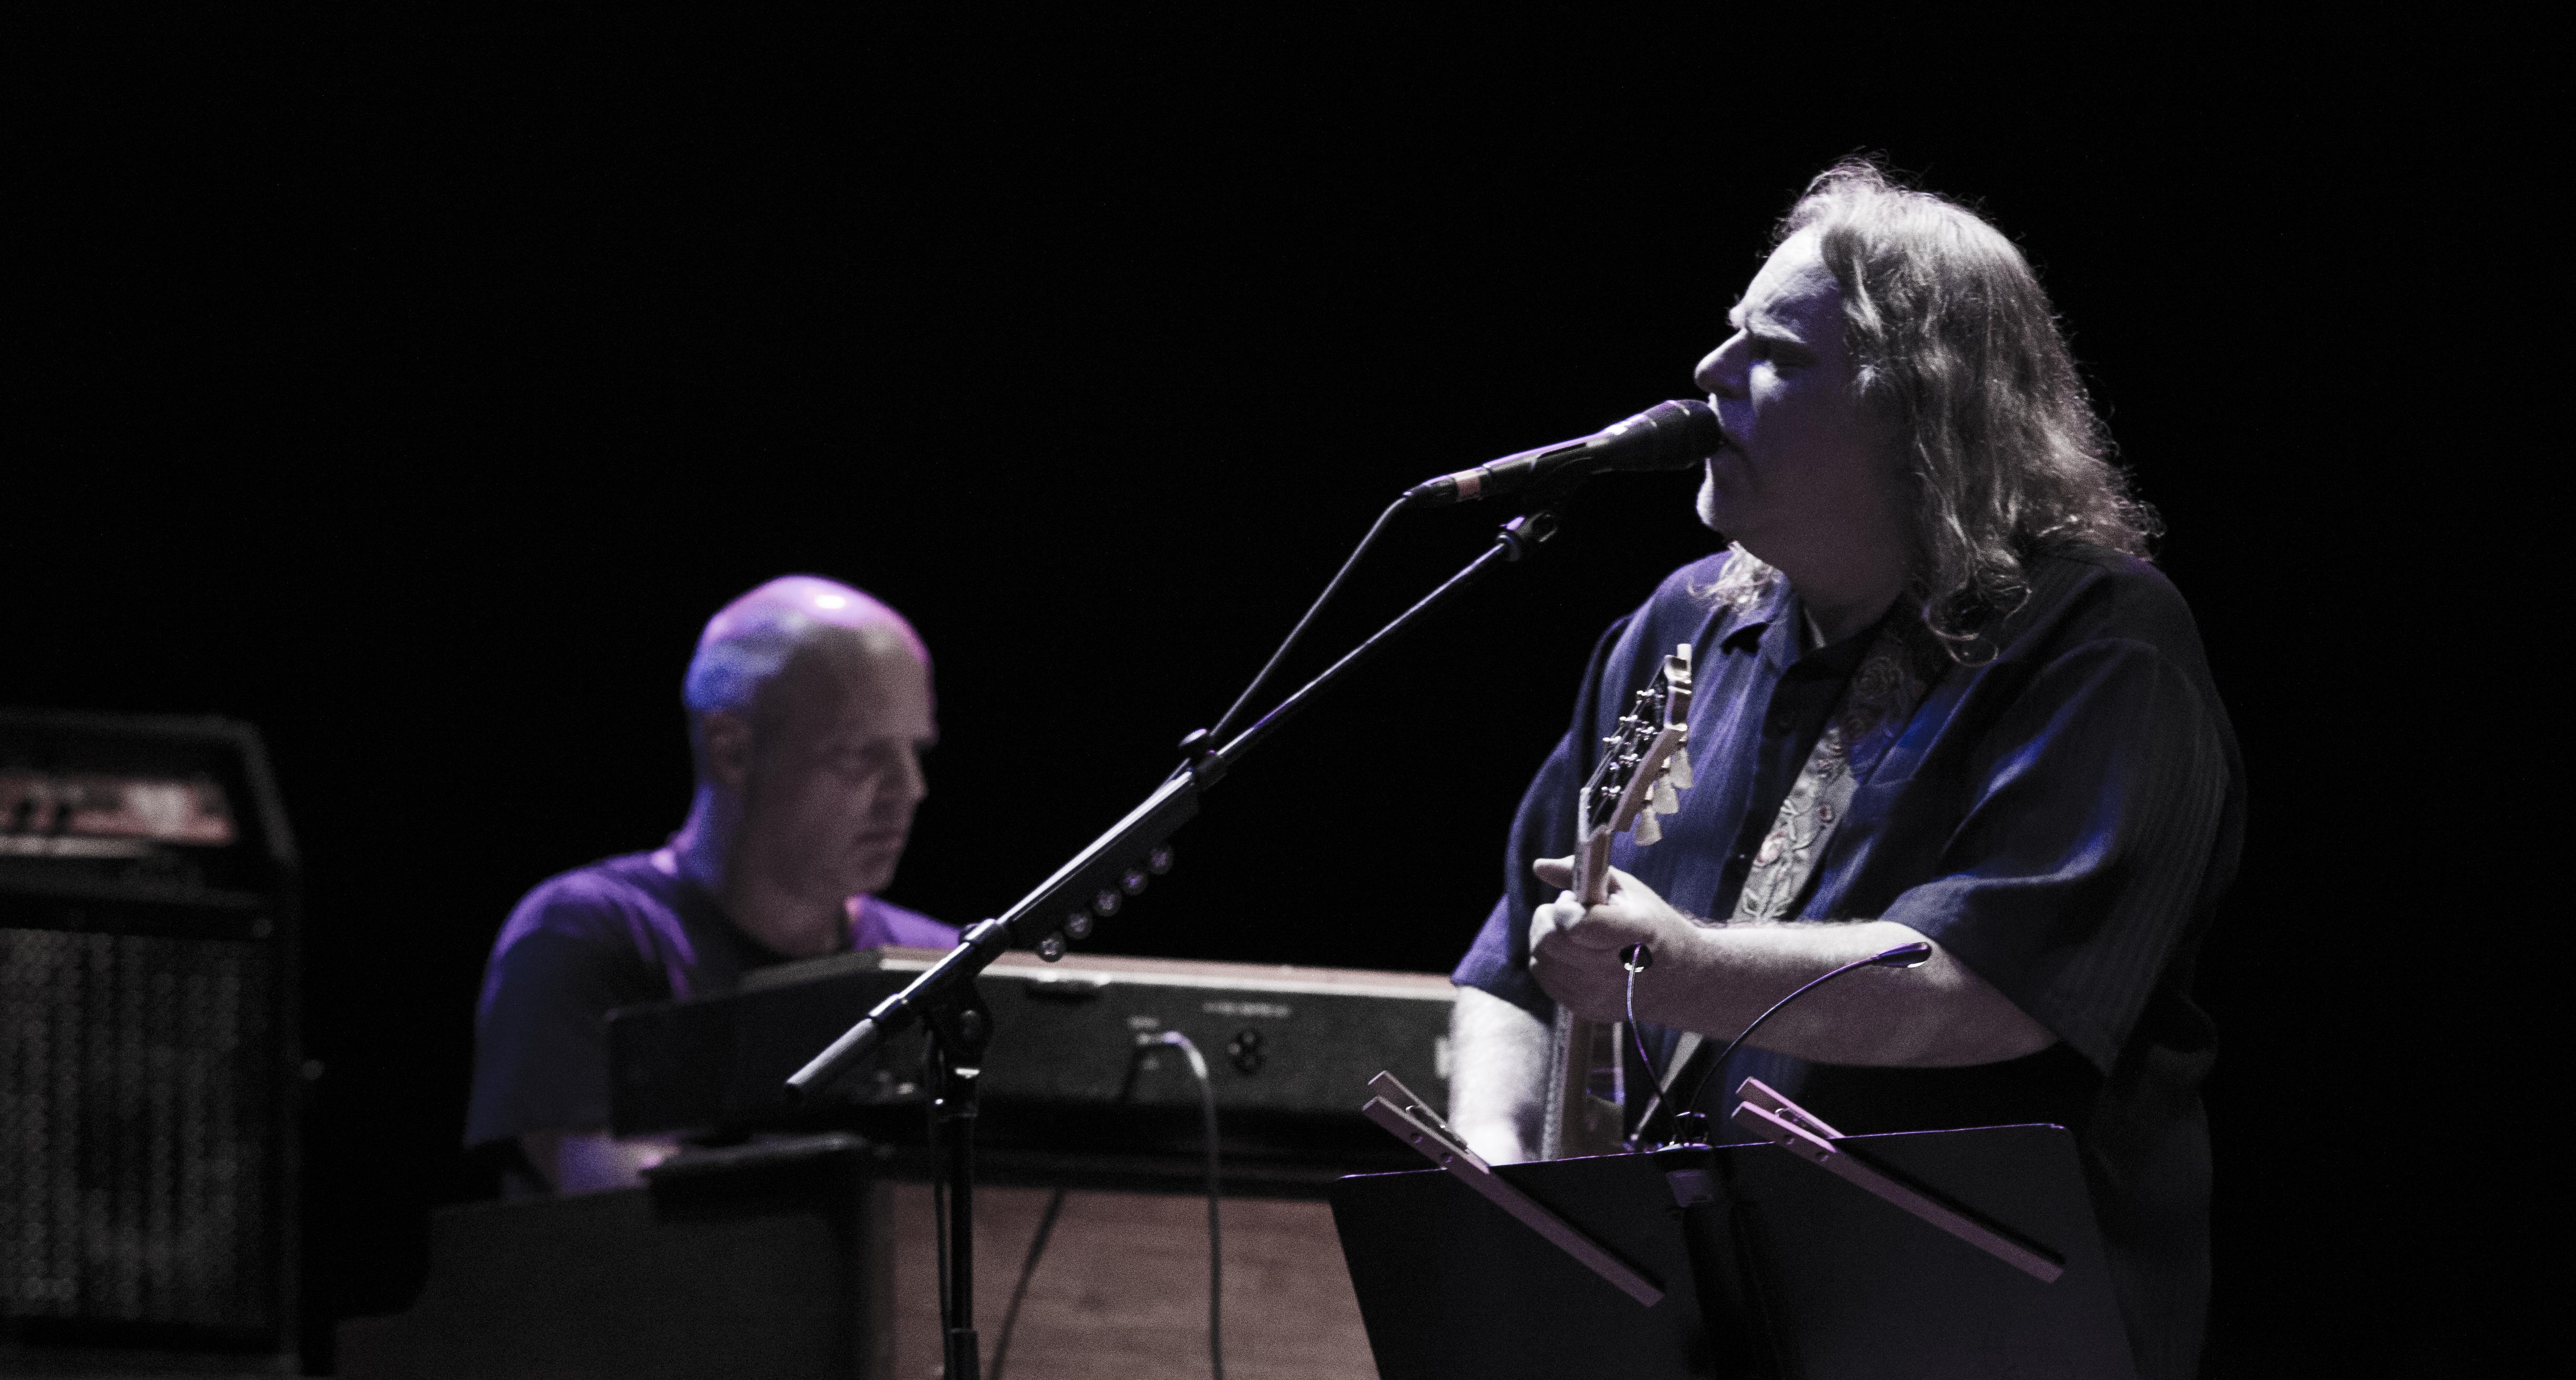 Warren Haynes performing at LOCKN Music Festival 2014. Photo by: Matthew McGuire